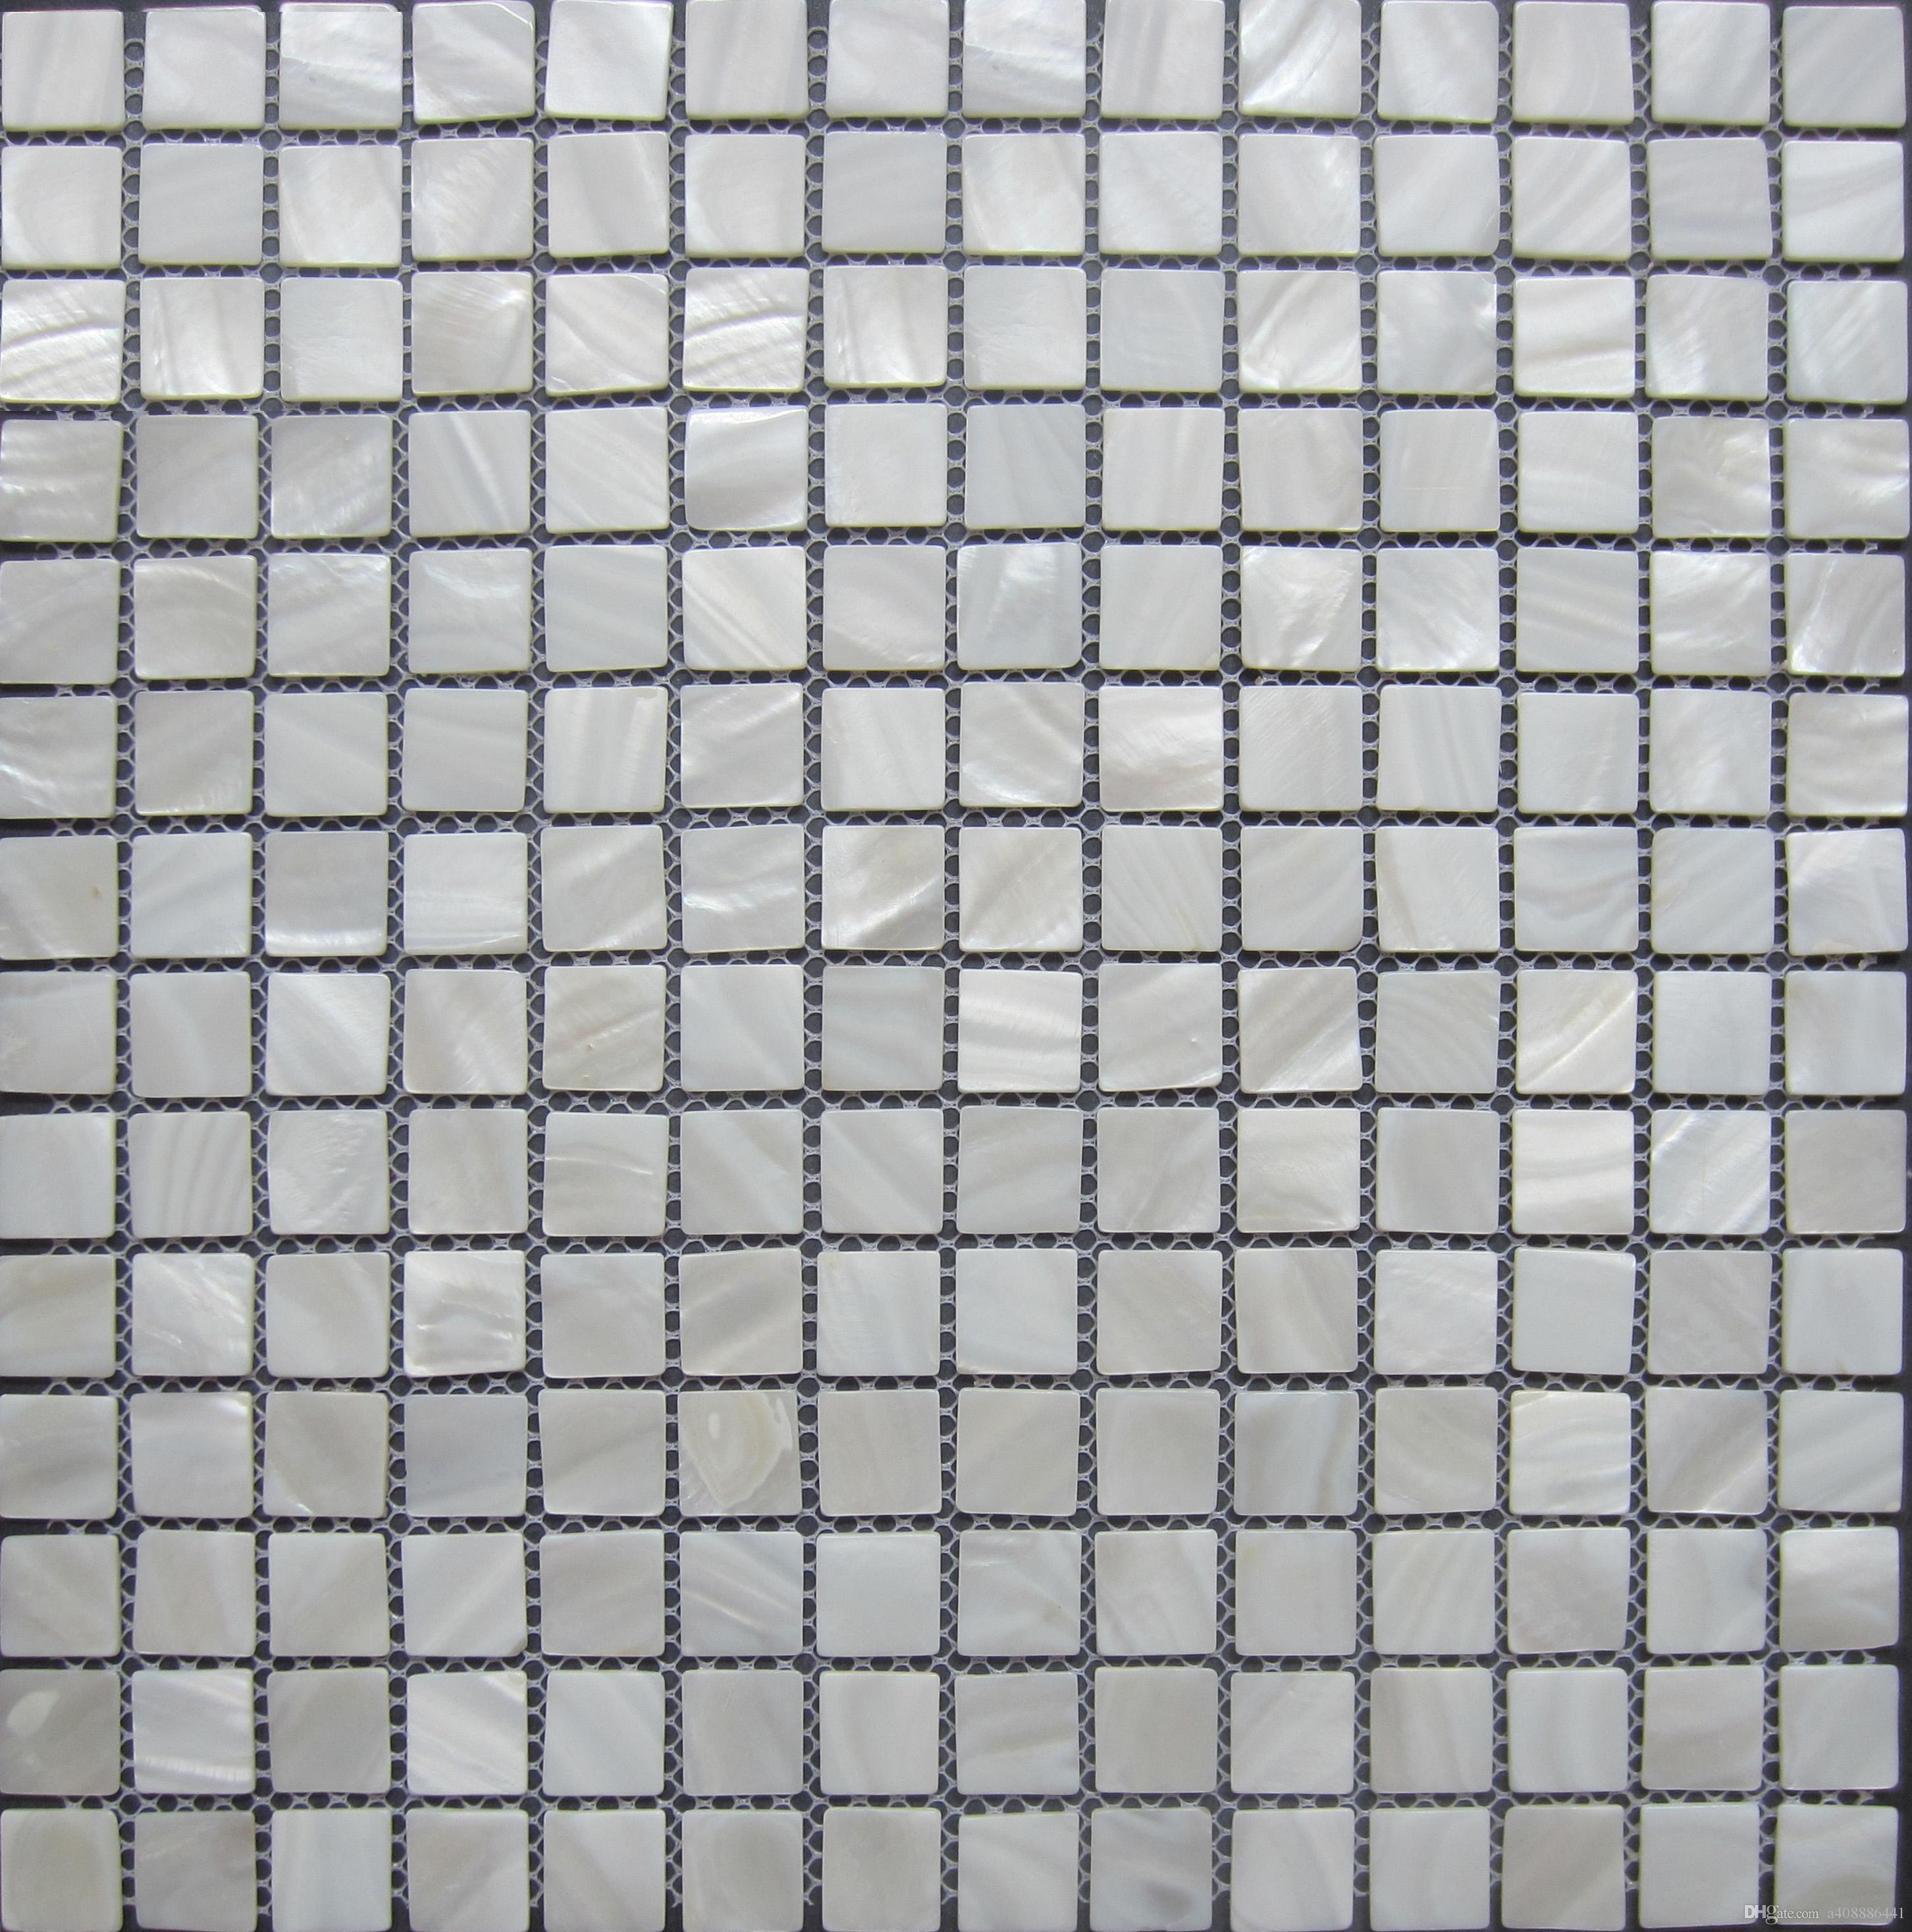 lustre mosaico Wall tiles; Pure White mother of pearl shell mosaic tiles; kitchen backsplash tiles ;bathroom mirror tile